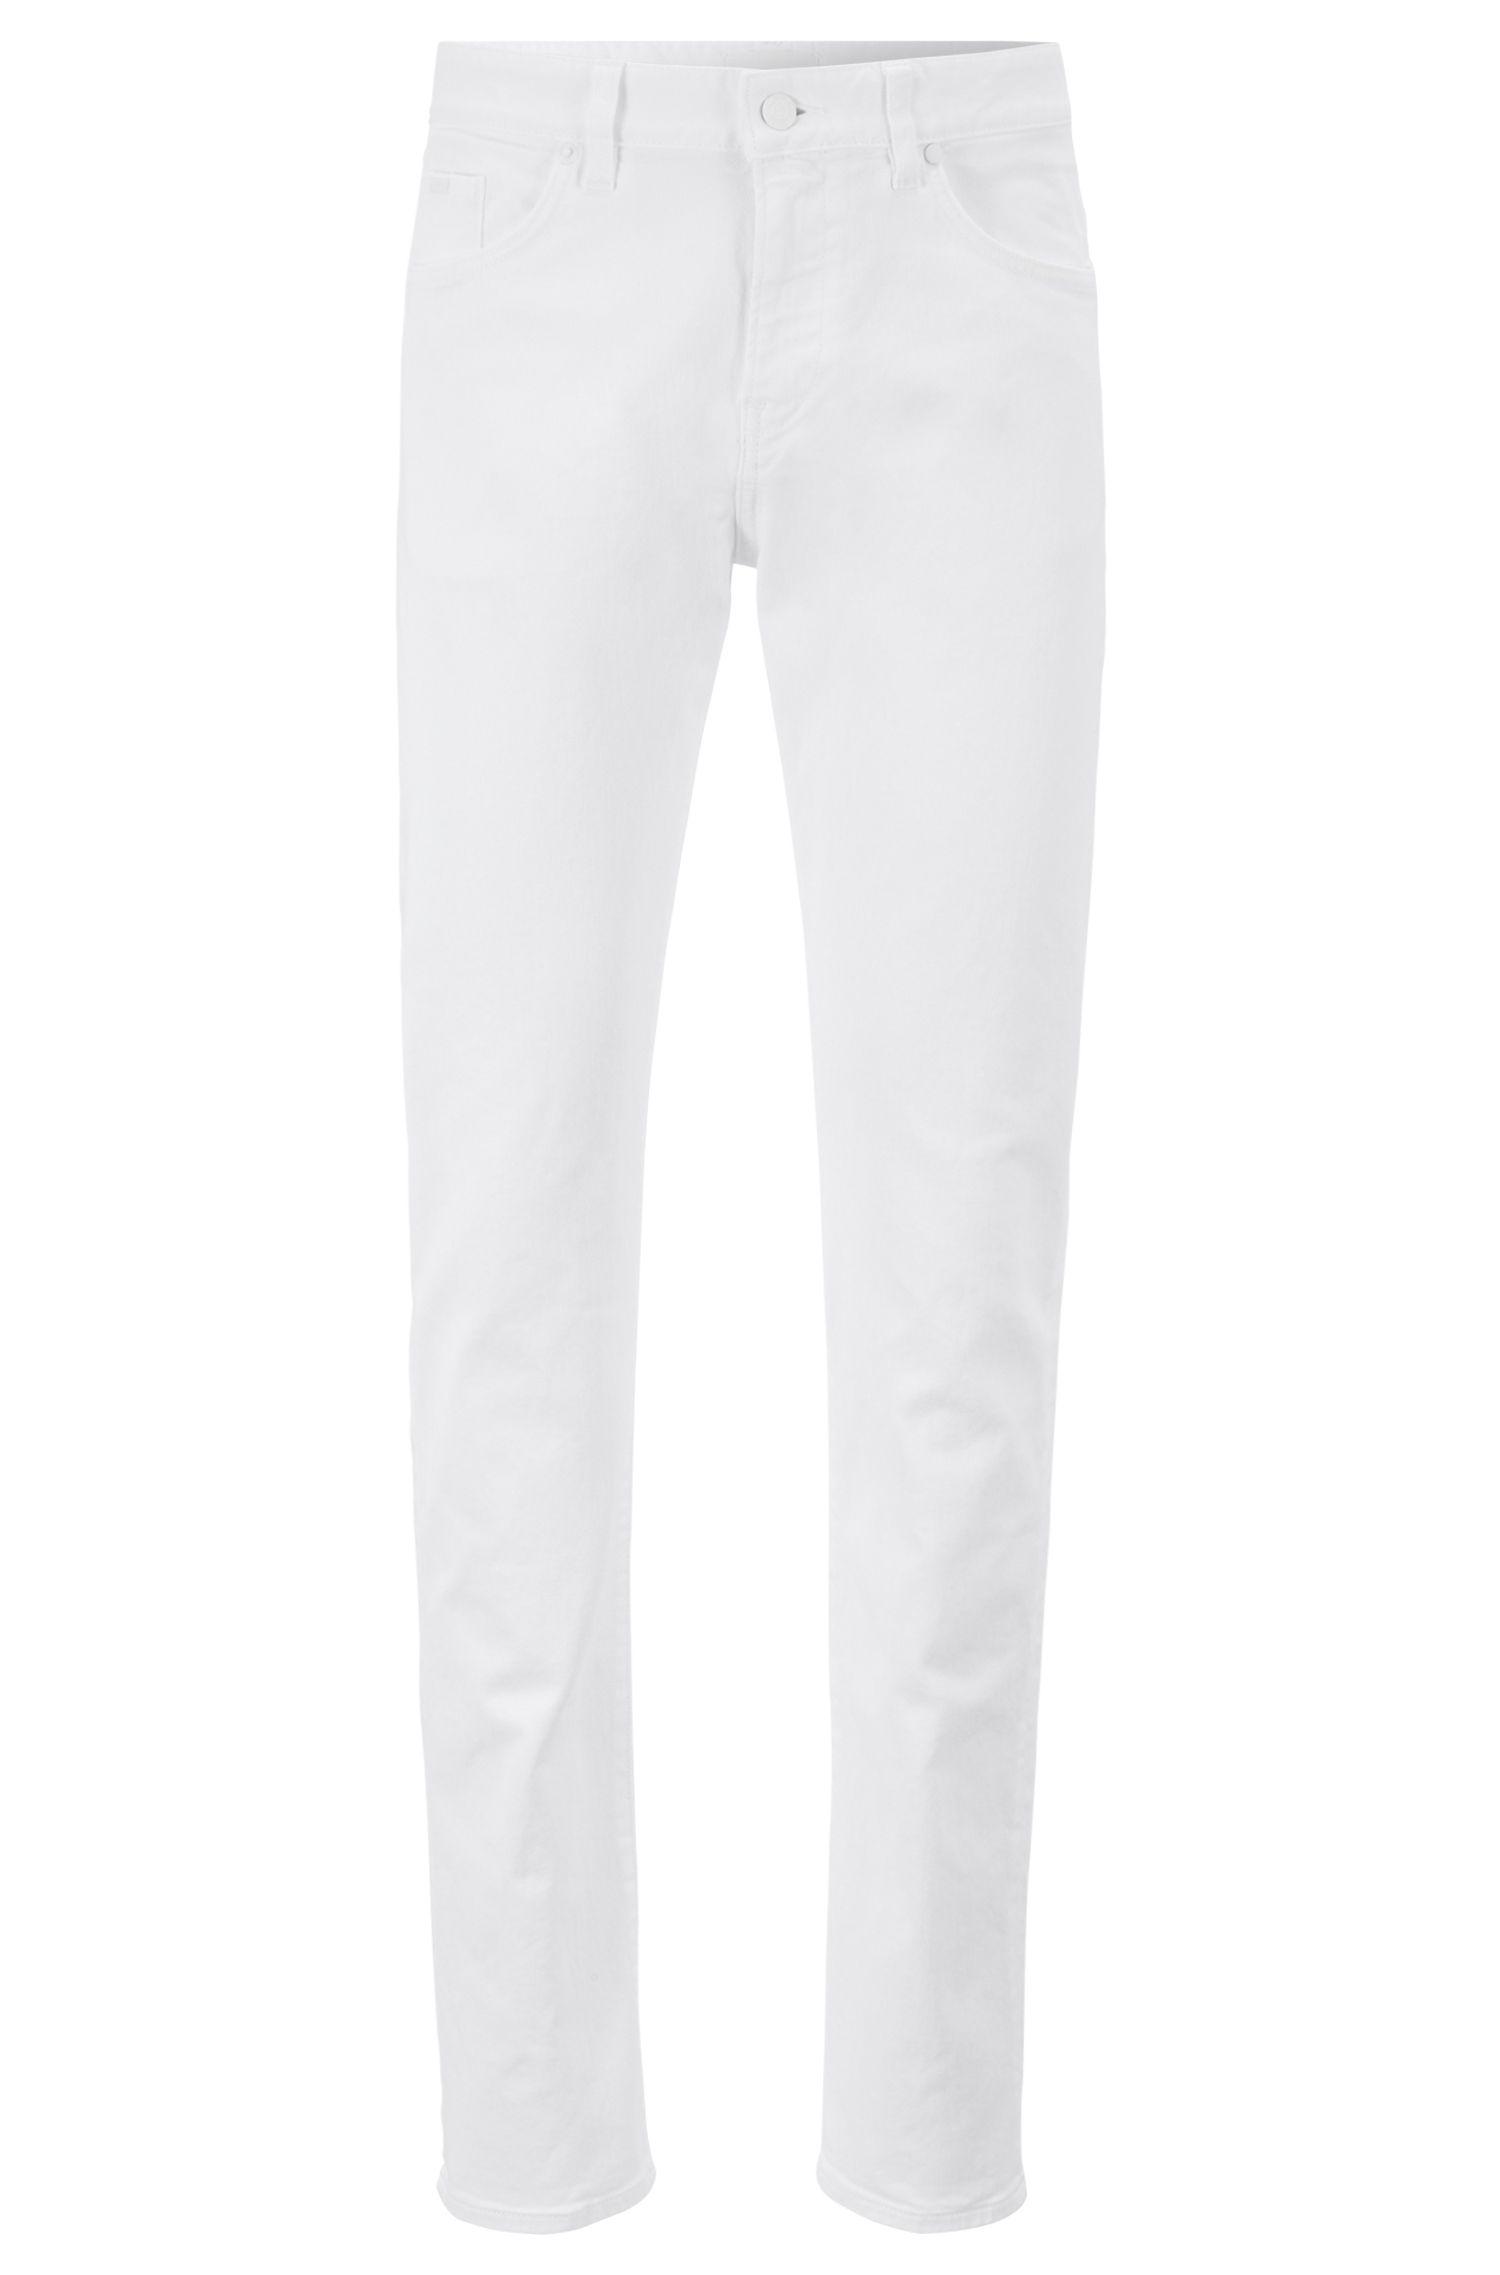 Slim-Fit Jeans aus überfärbtem Stretch-Denim, Weiß